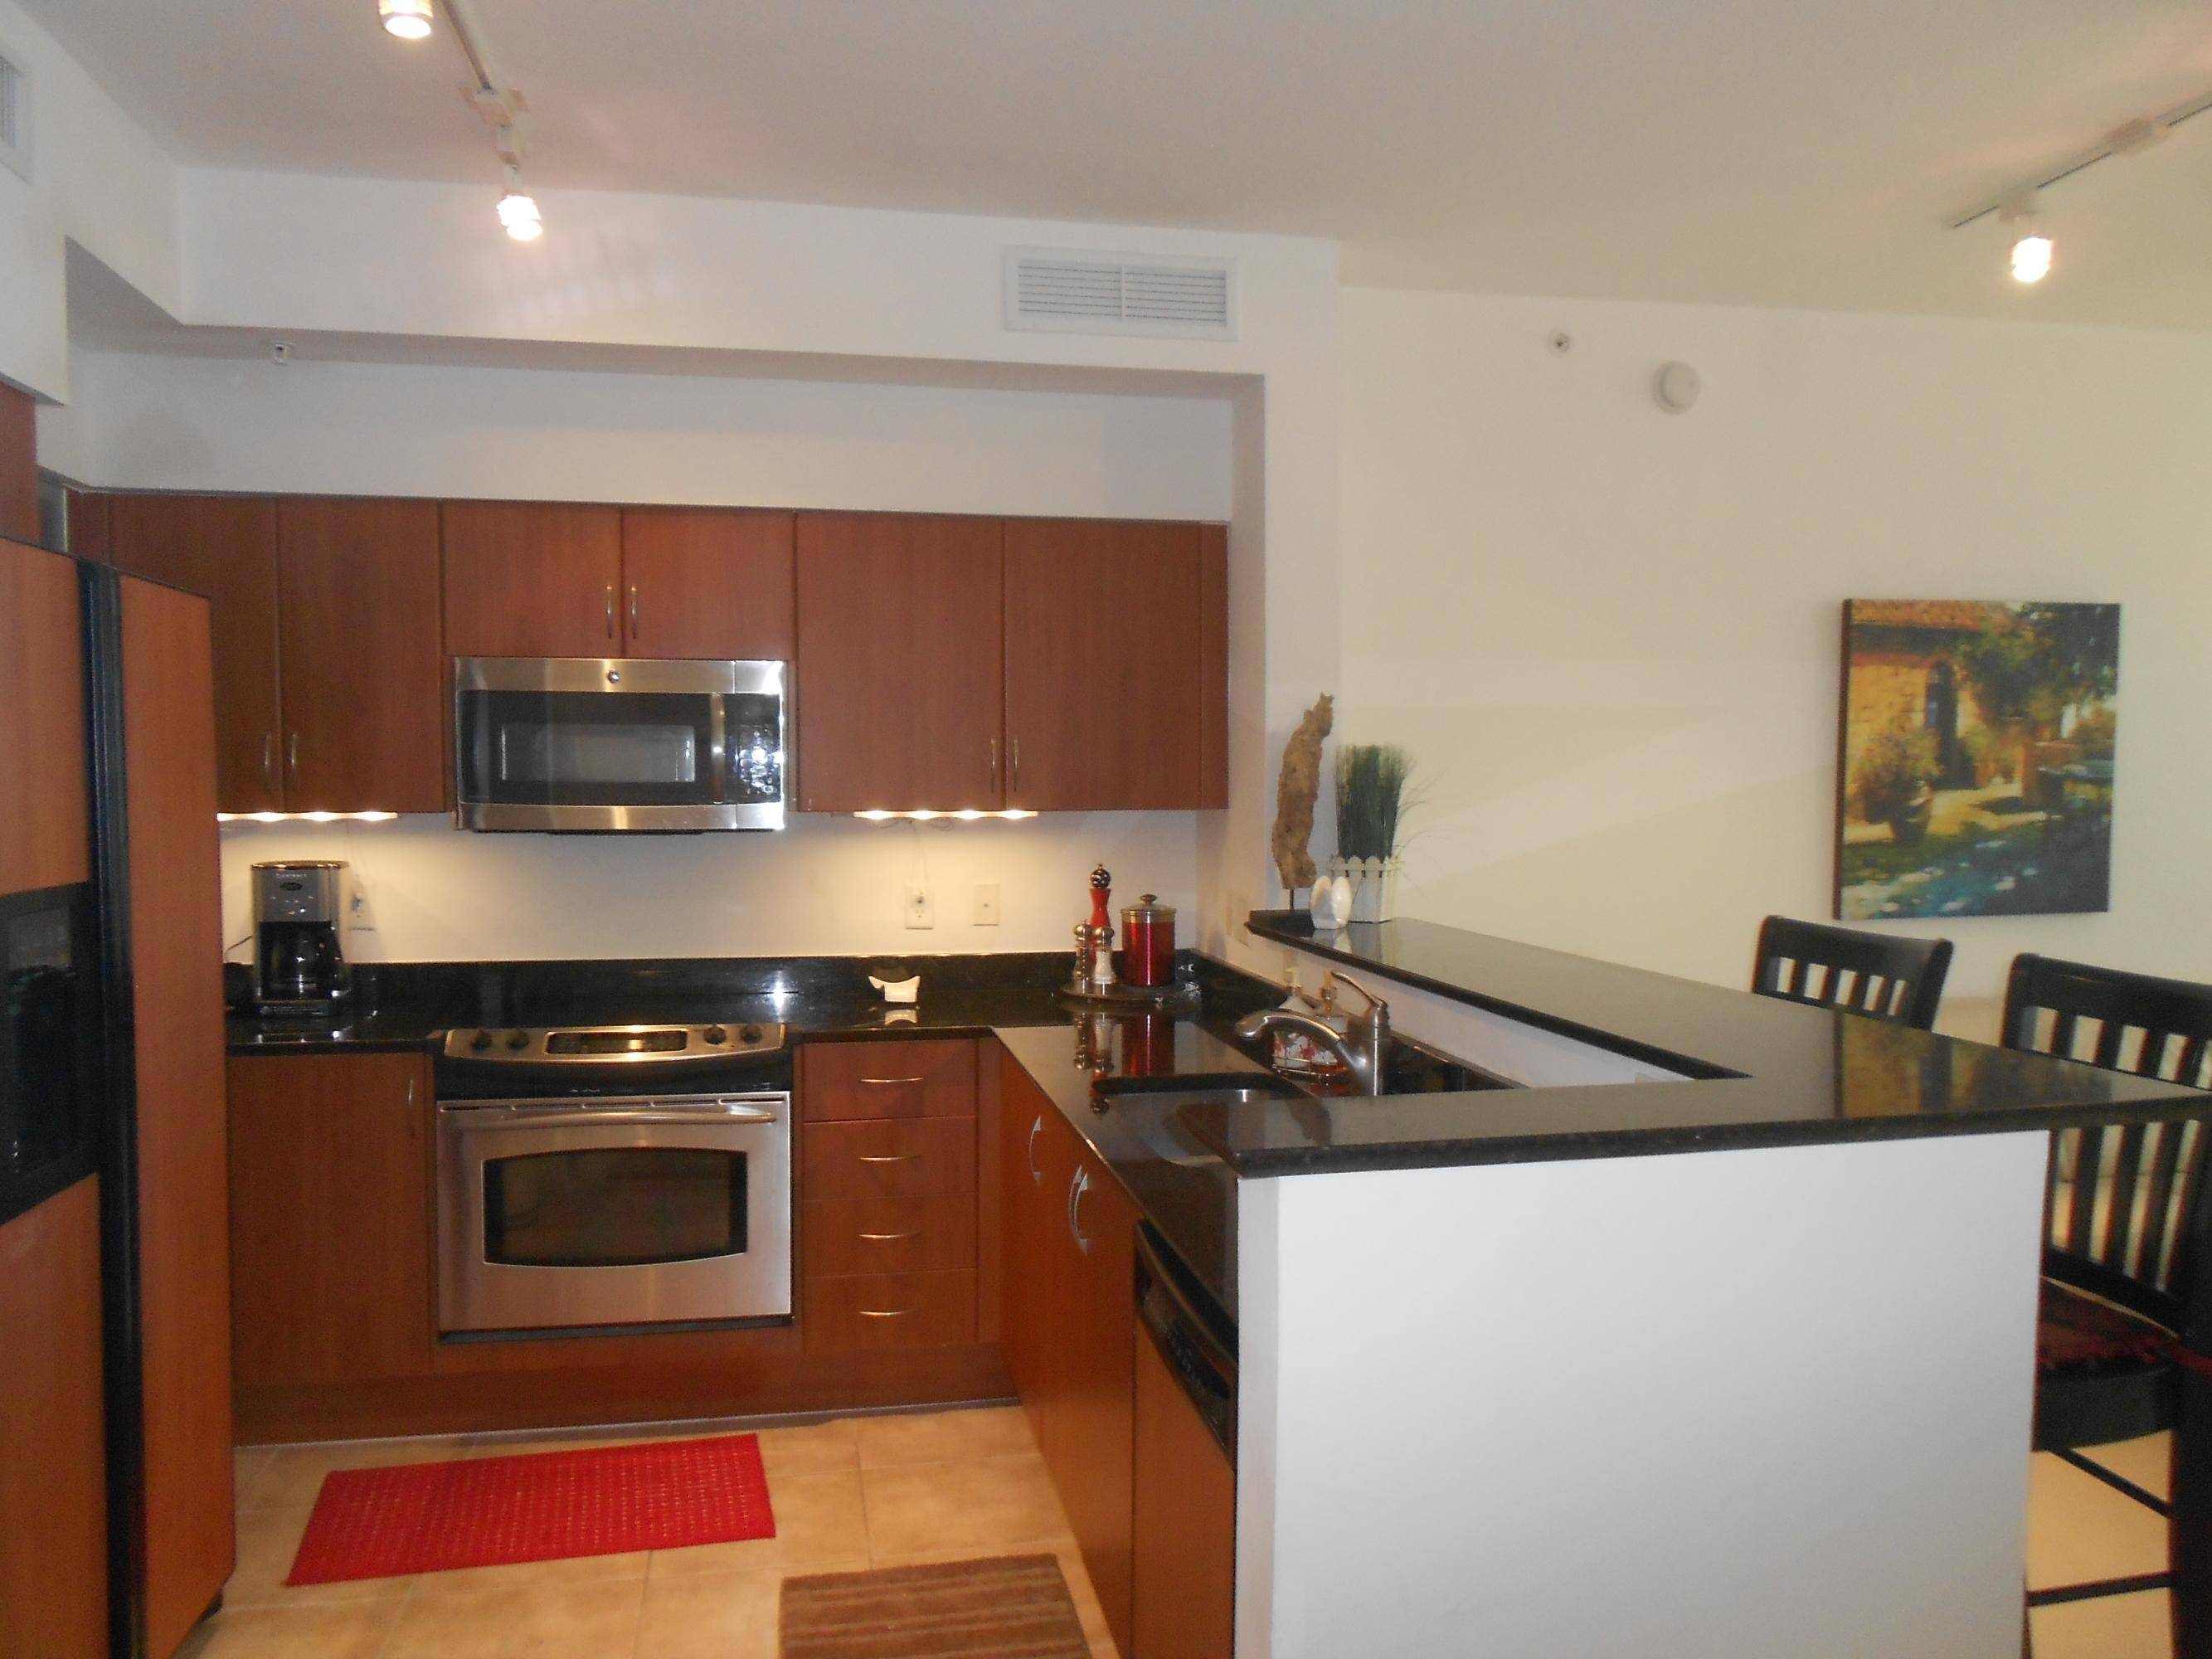 806 Windward Way, Lantana, Florida 33462, 2 Bedrooms Bedrooms, ,2 BathroomsBathrooms,Rental,For Sale,Windward,RX-10672972